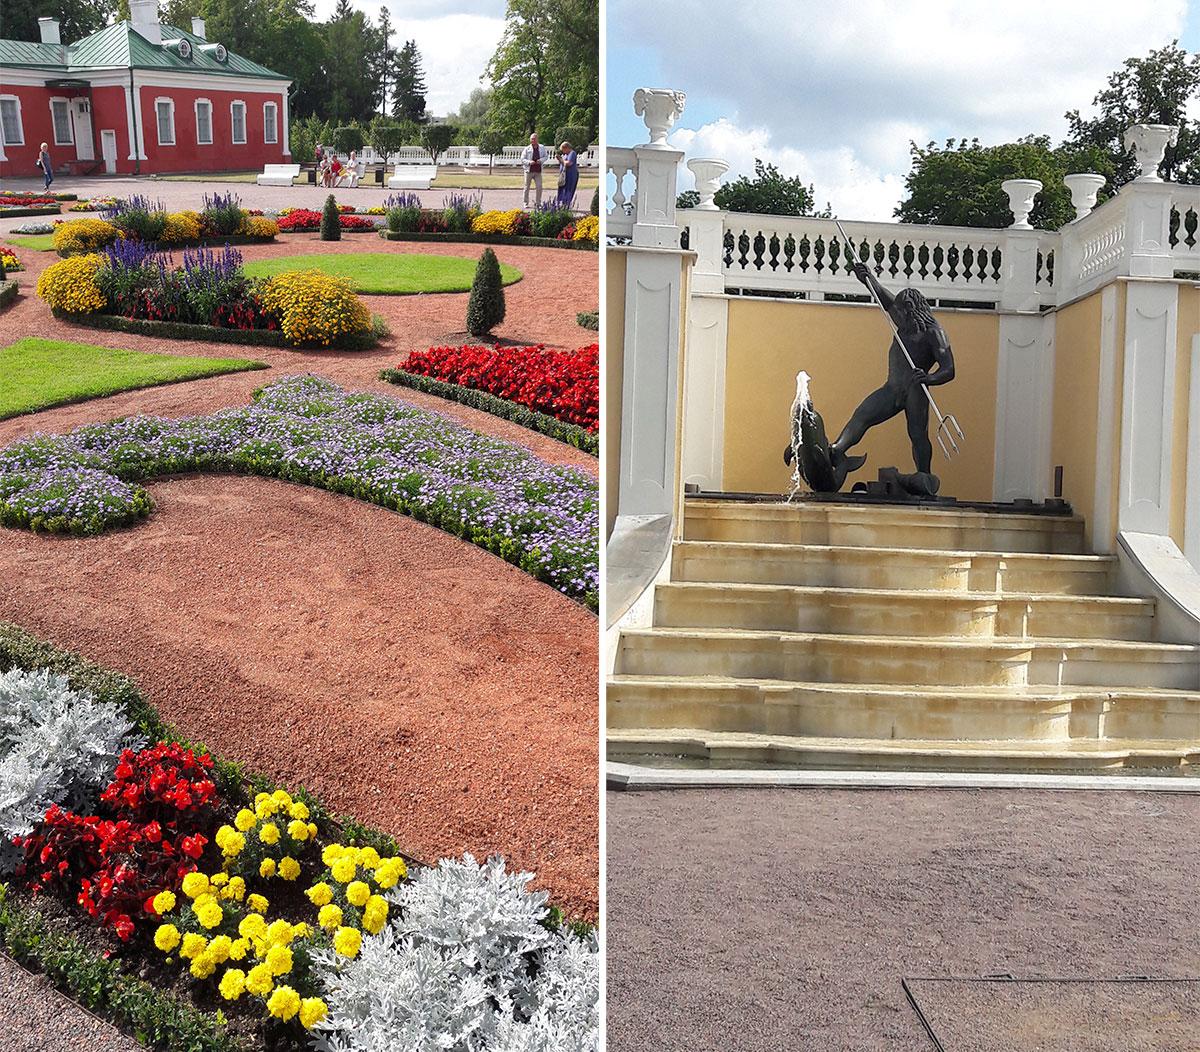 Таллин - красивейший город Прибалтики. Легенда про старичка из Юлемисте